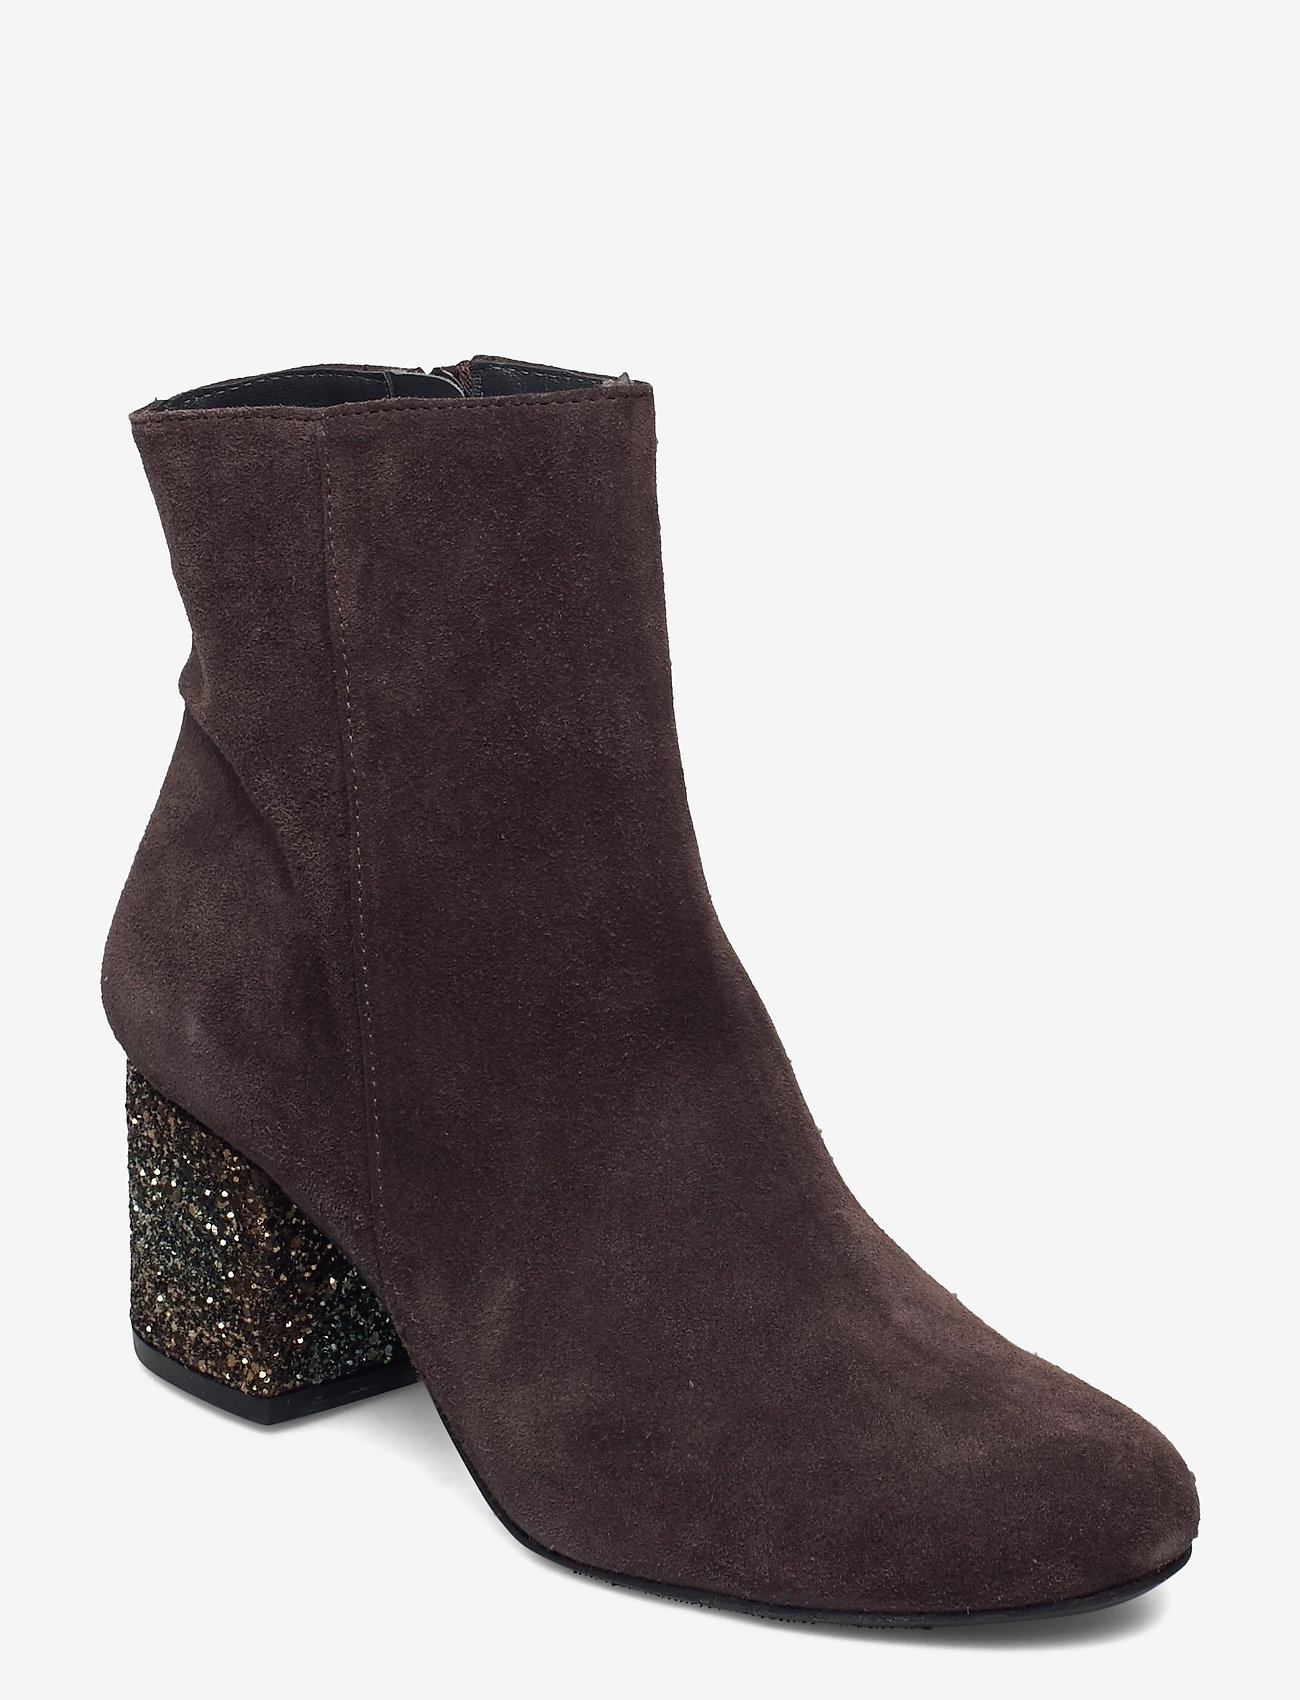 ANGULUS - Bootie - block heel - with zippe - stiefeletten mit absatz - 2193/2487 brown/copper glit - 0